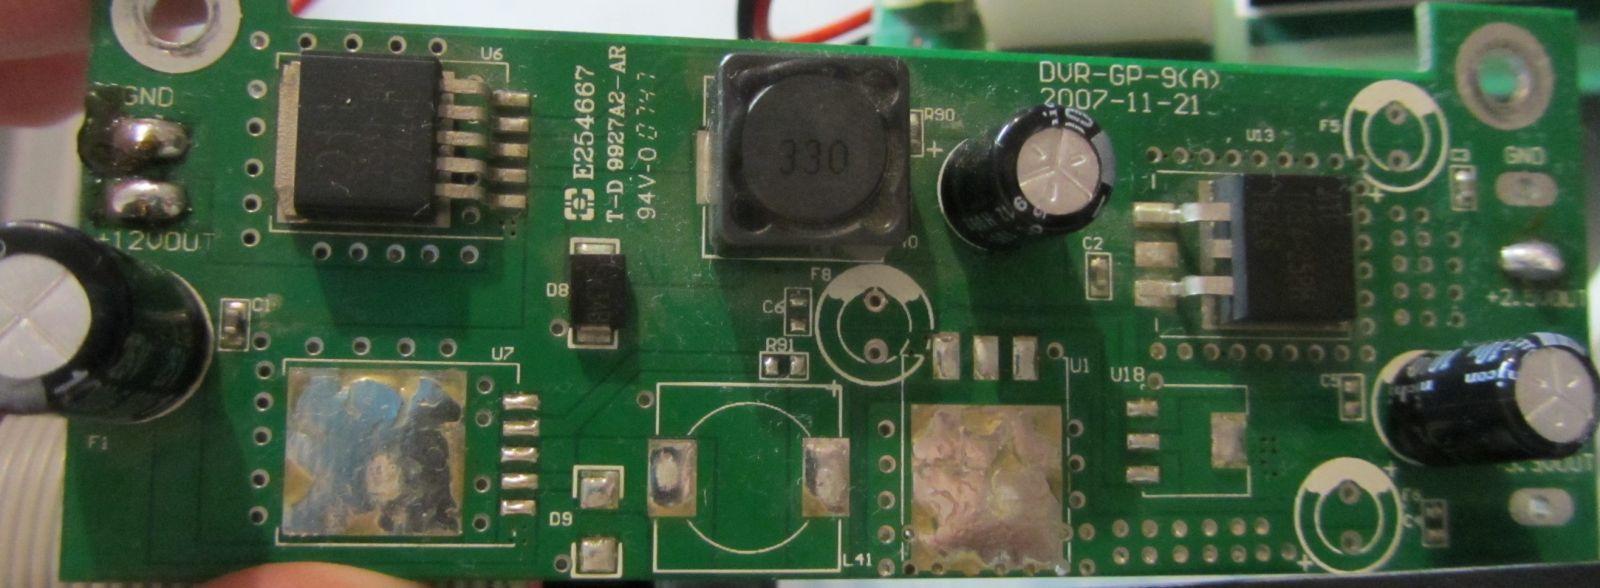 Hack Corellation: Follow-up on 2x DVR repair